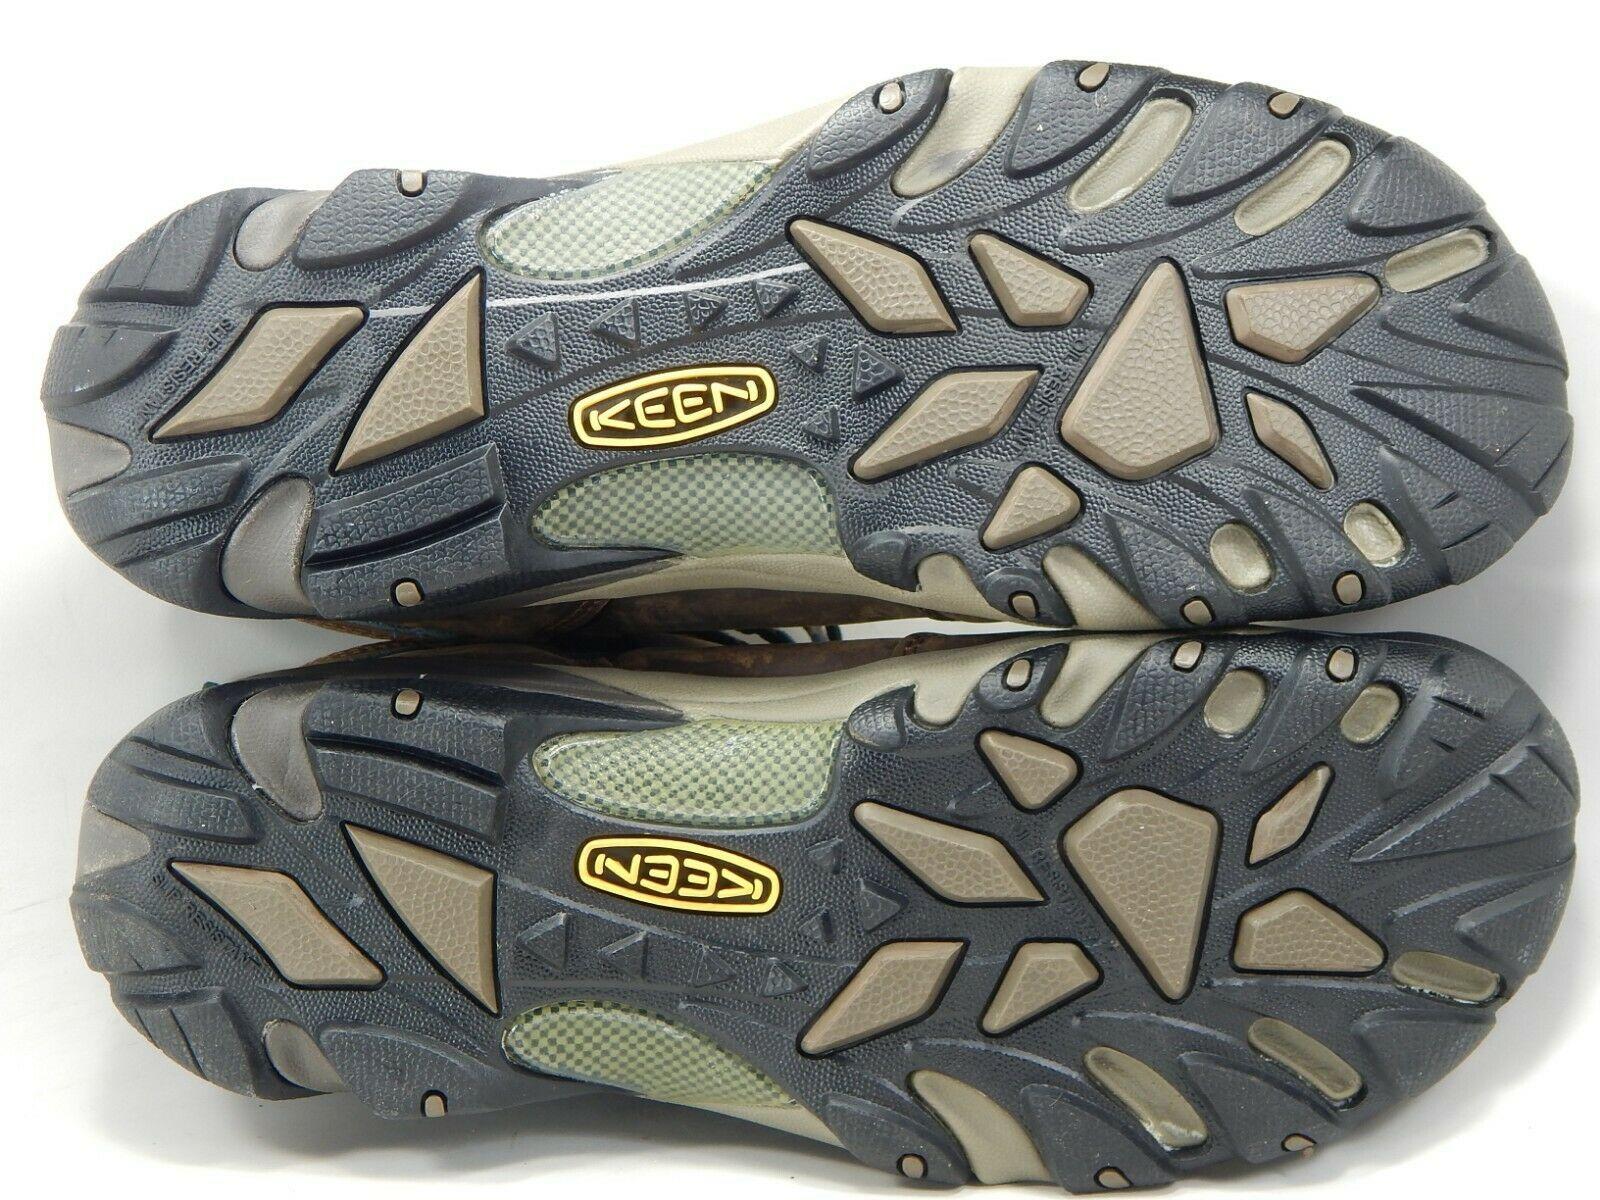 Keen Detroit Mid Size US 13 M (D) EU 47 Men's Steel Toe Work Boots Brown 1007004